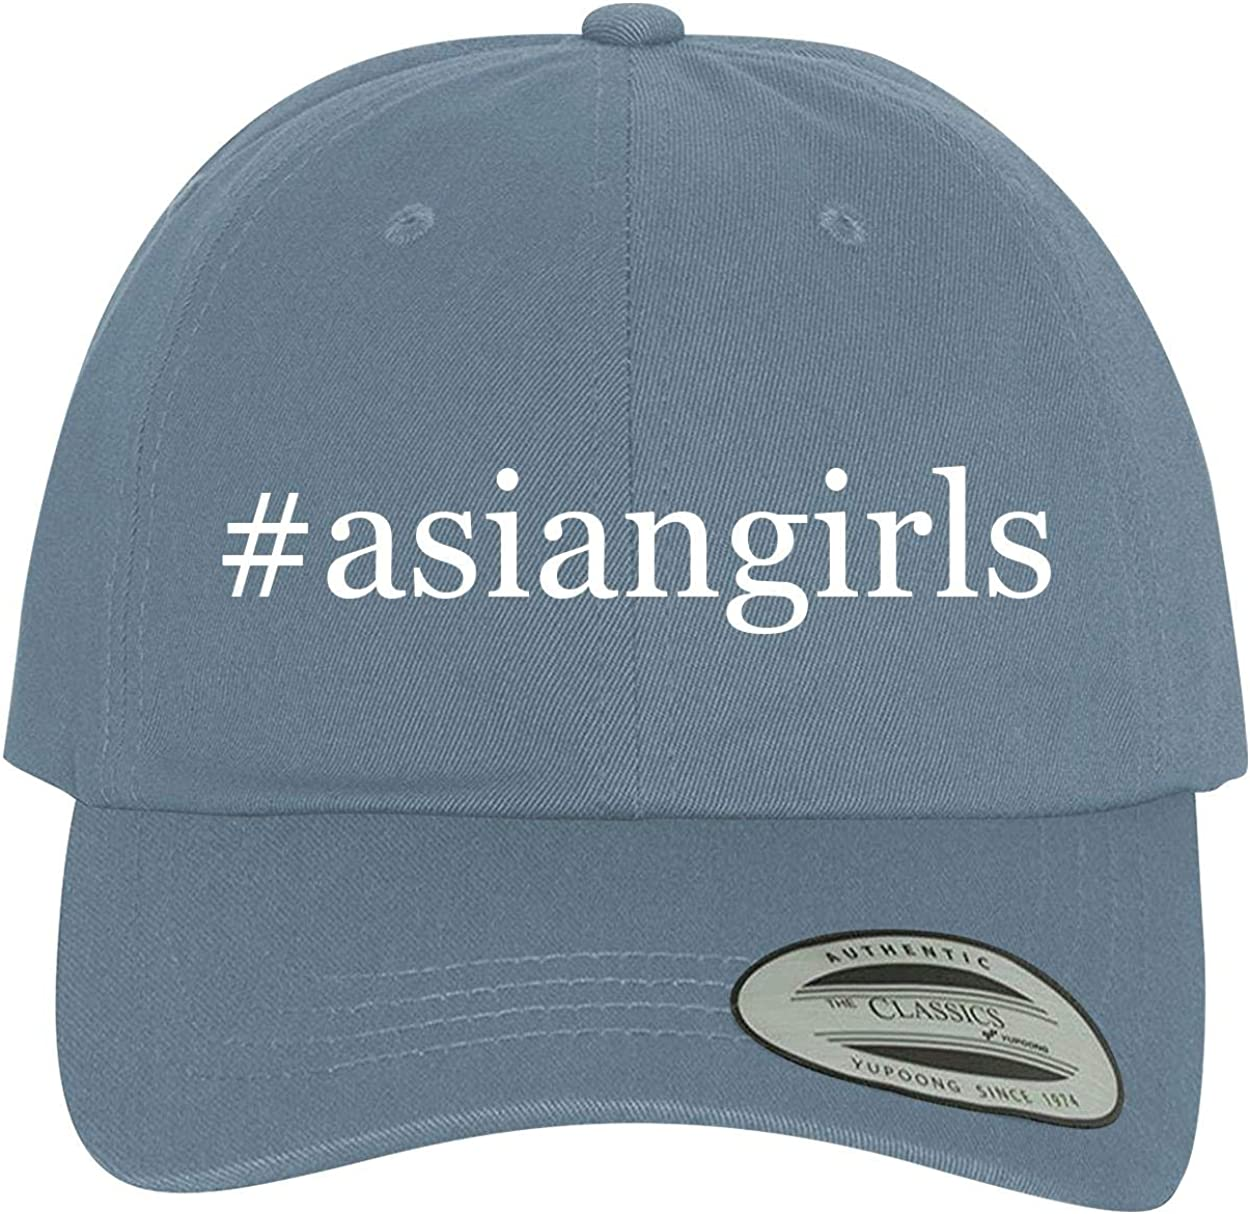 BH Cool Designs #asiangirls Comfortable Dad Hat Baseball Cap